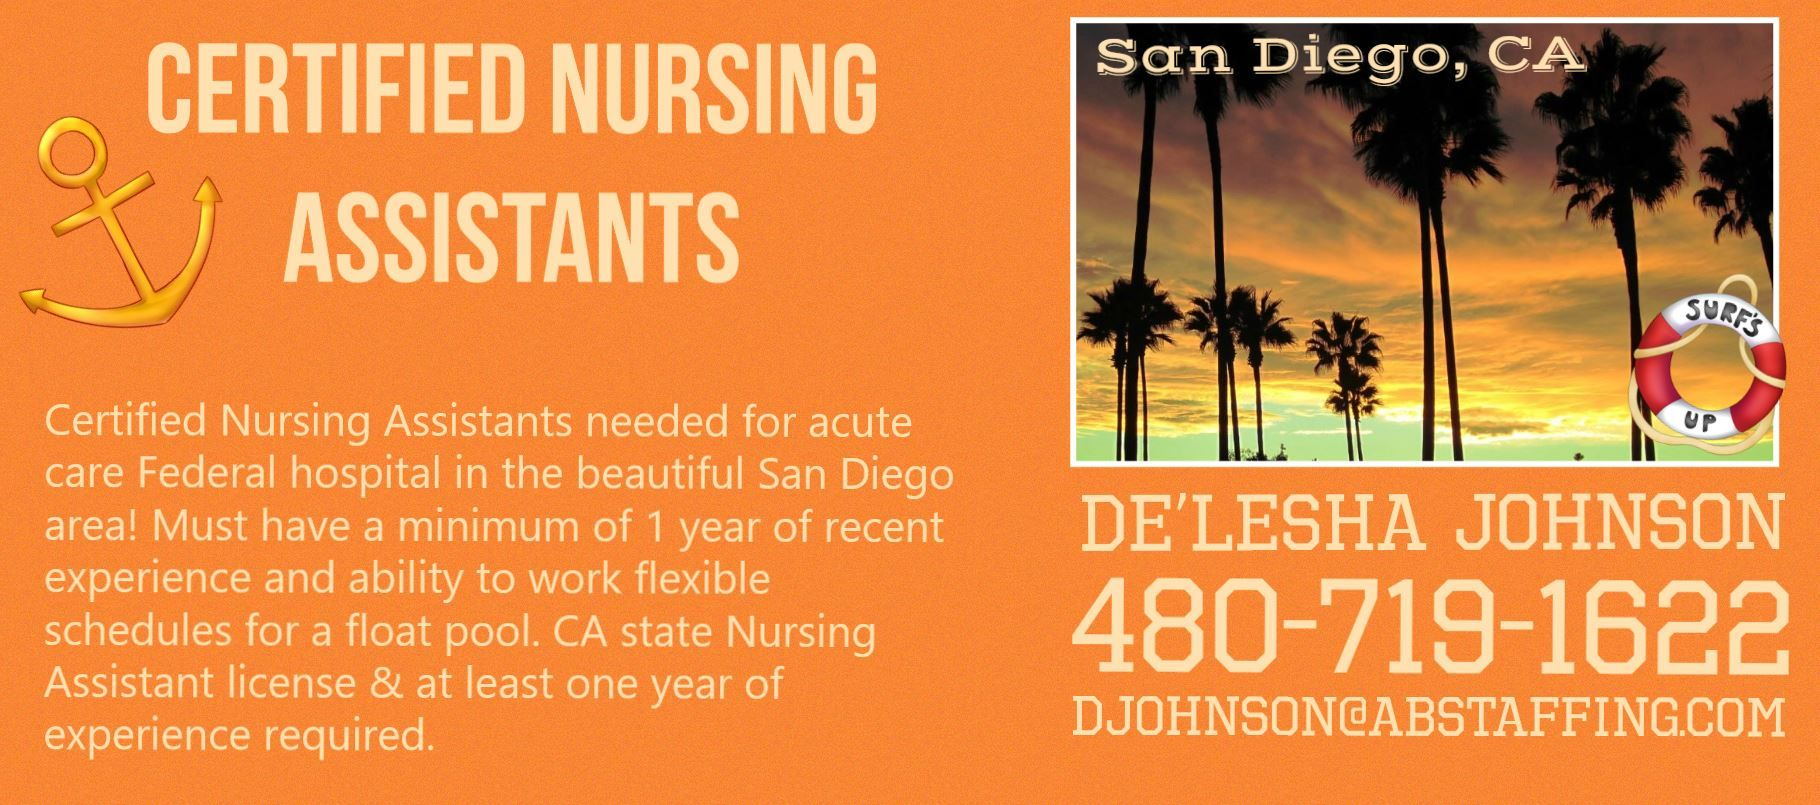 CNAs San Diego, CA! Email De'Lesha at djohnson